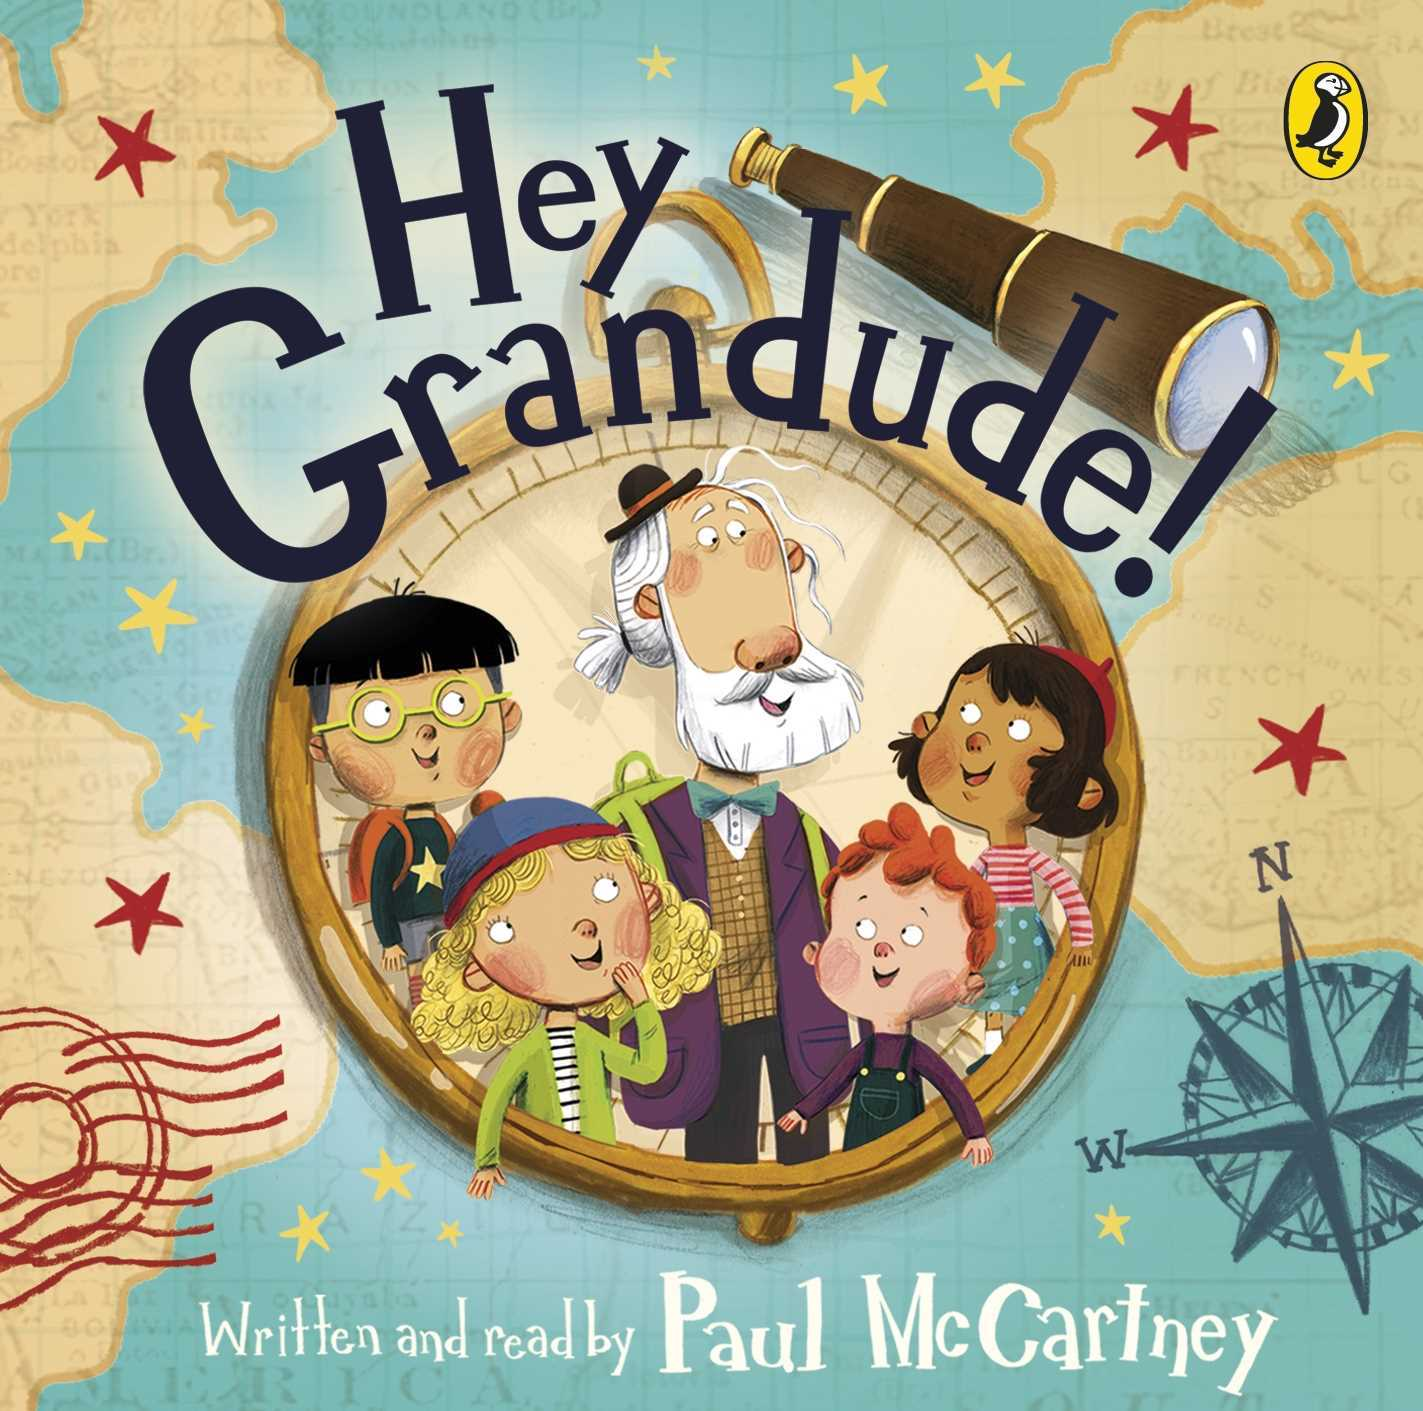 Hey Grandude! (CD Audiobook)